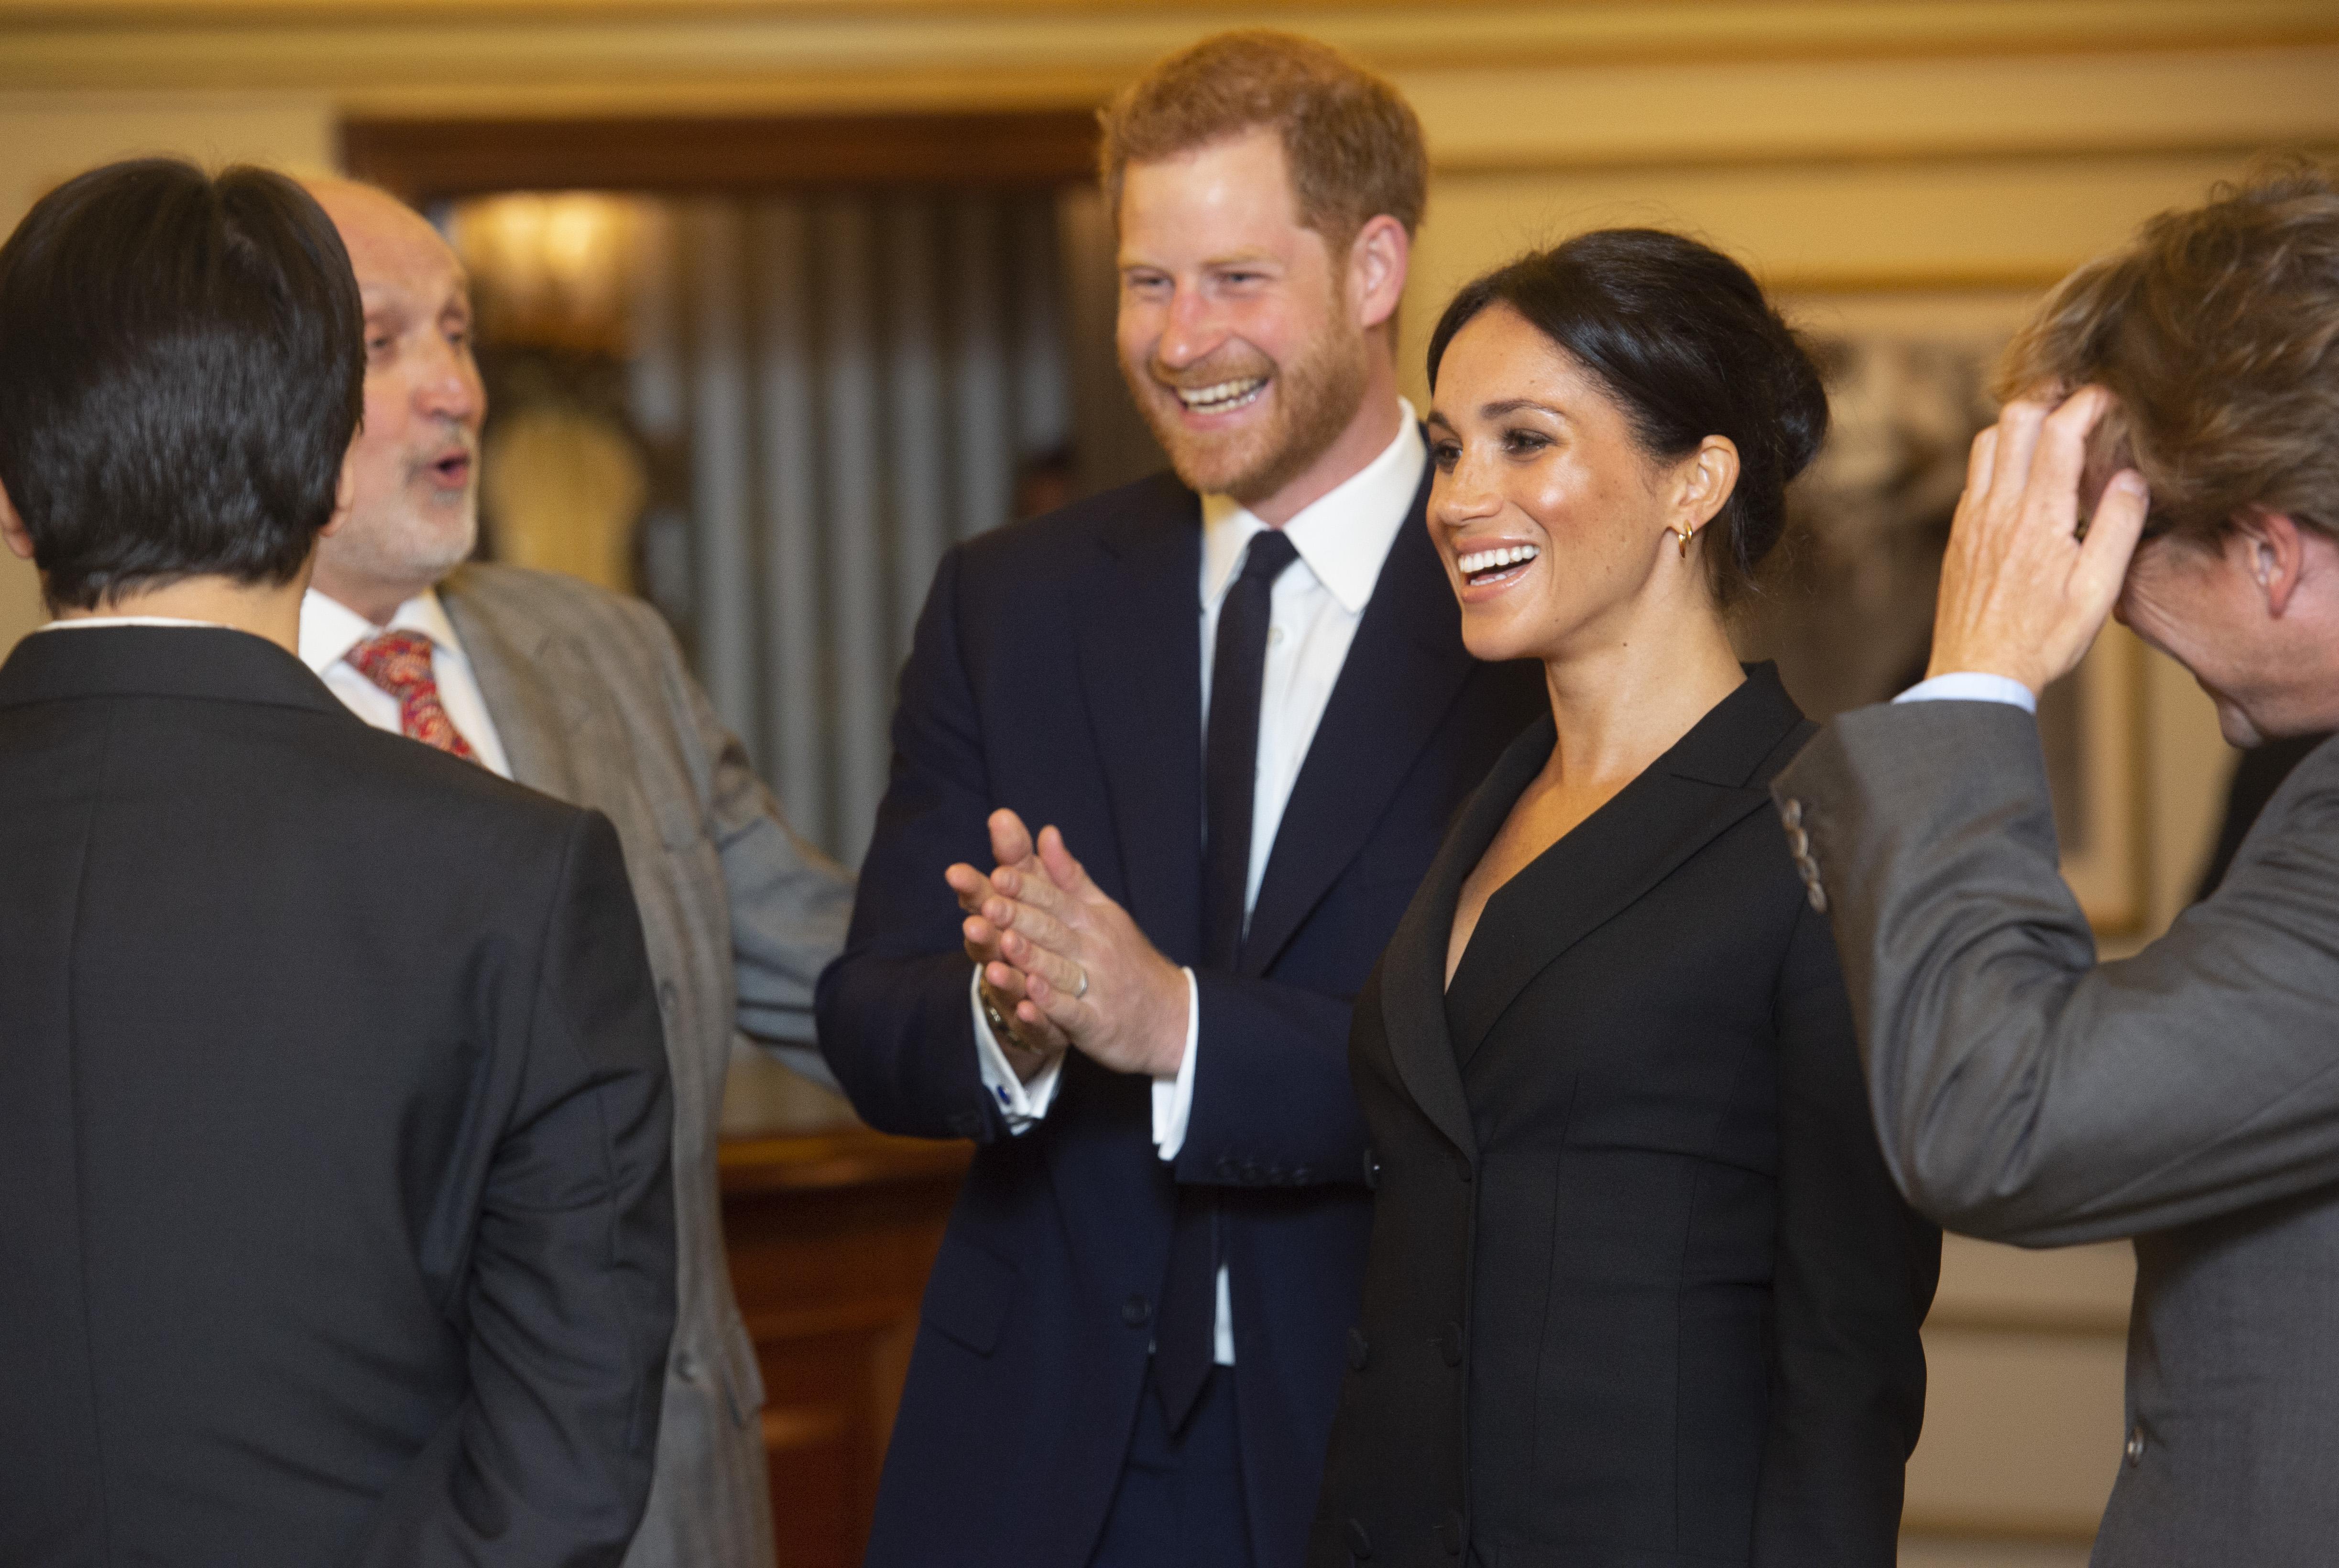 Meghan Markle and Prince Harry Join Lin-Manuel Miranda To See 'Hamilton' – Again